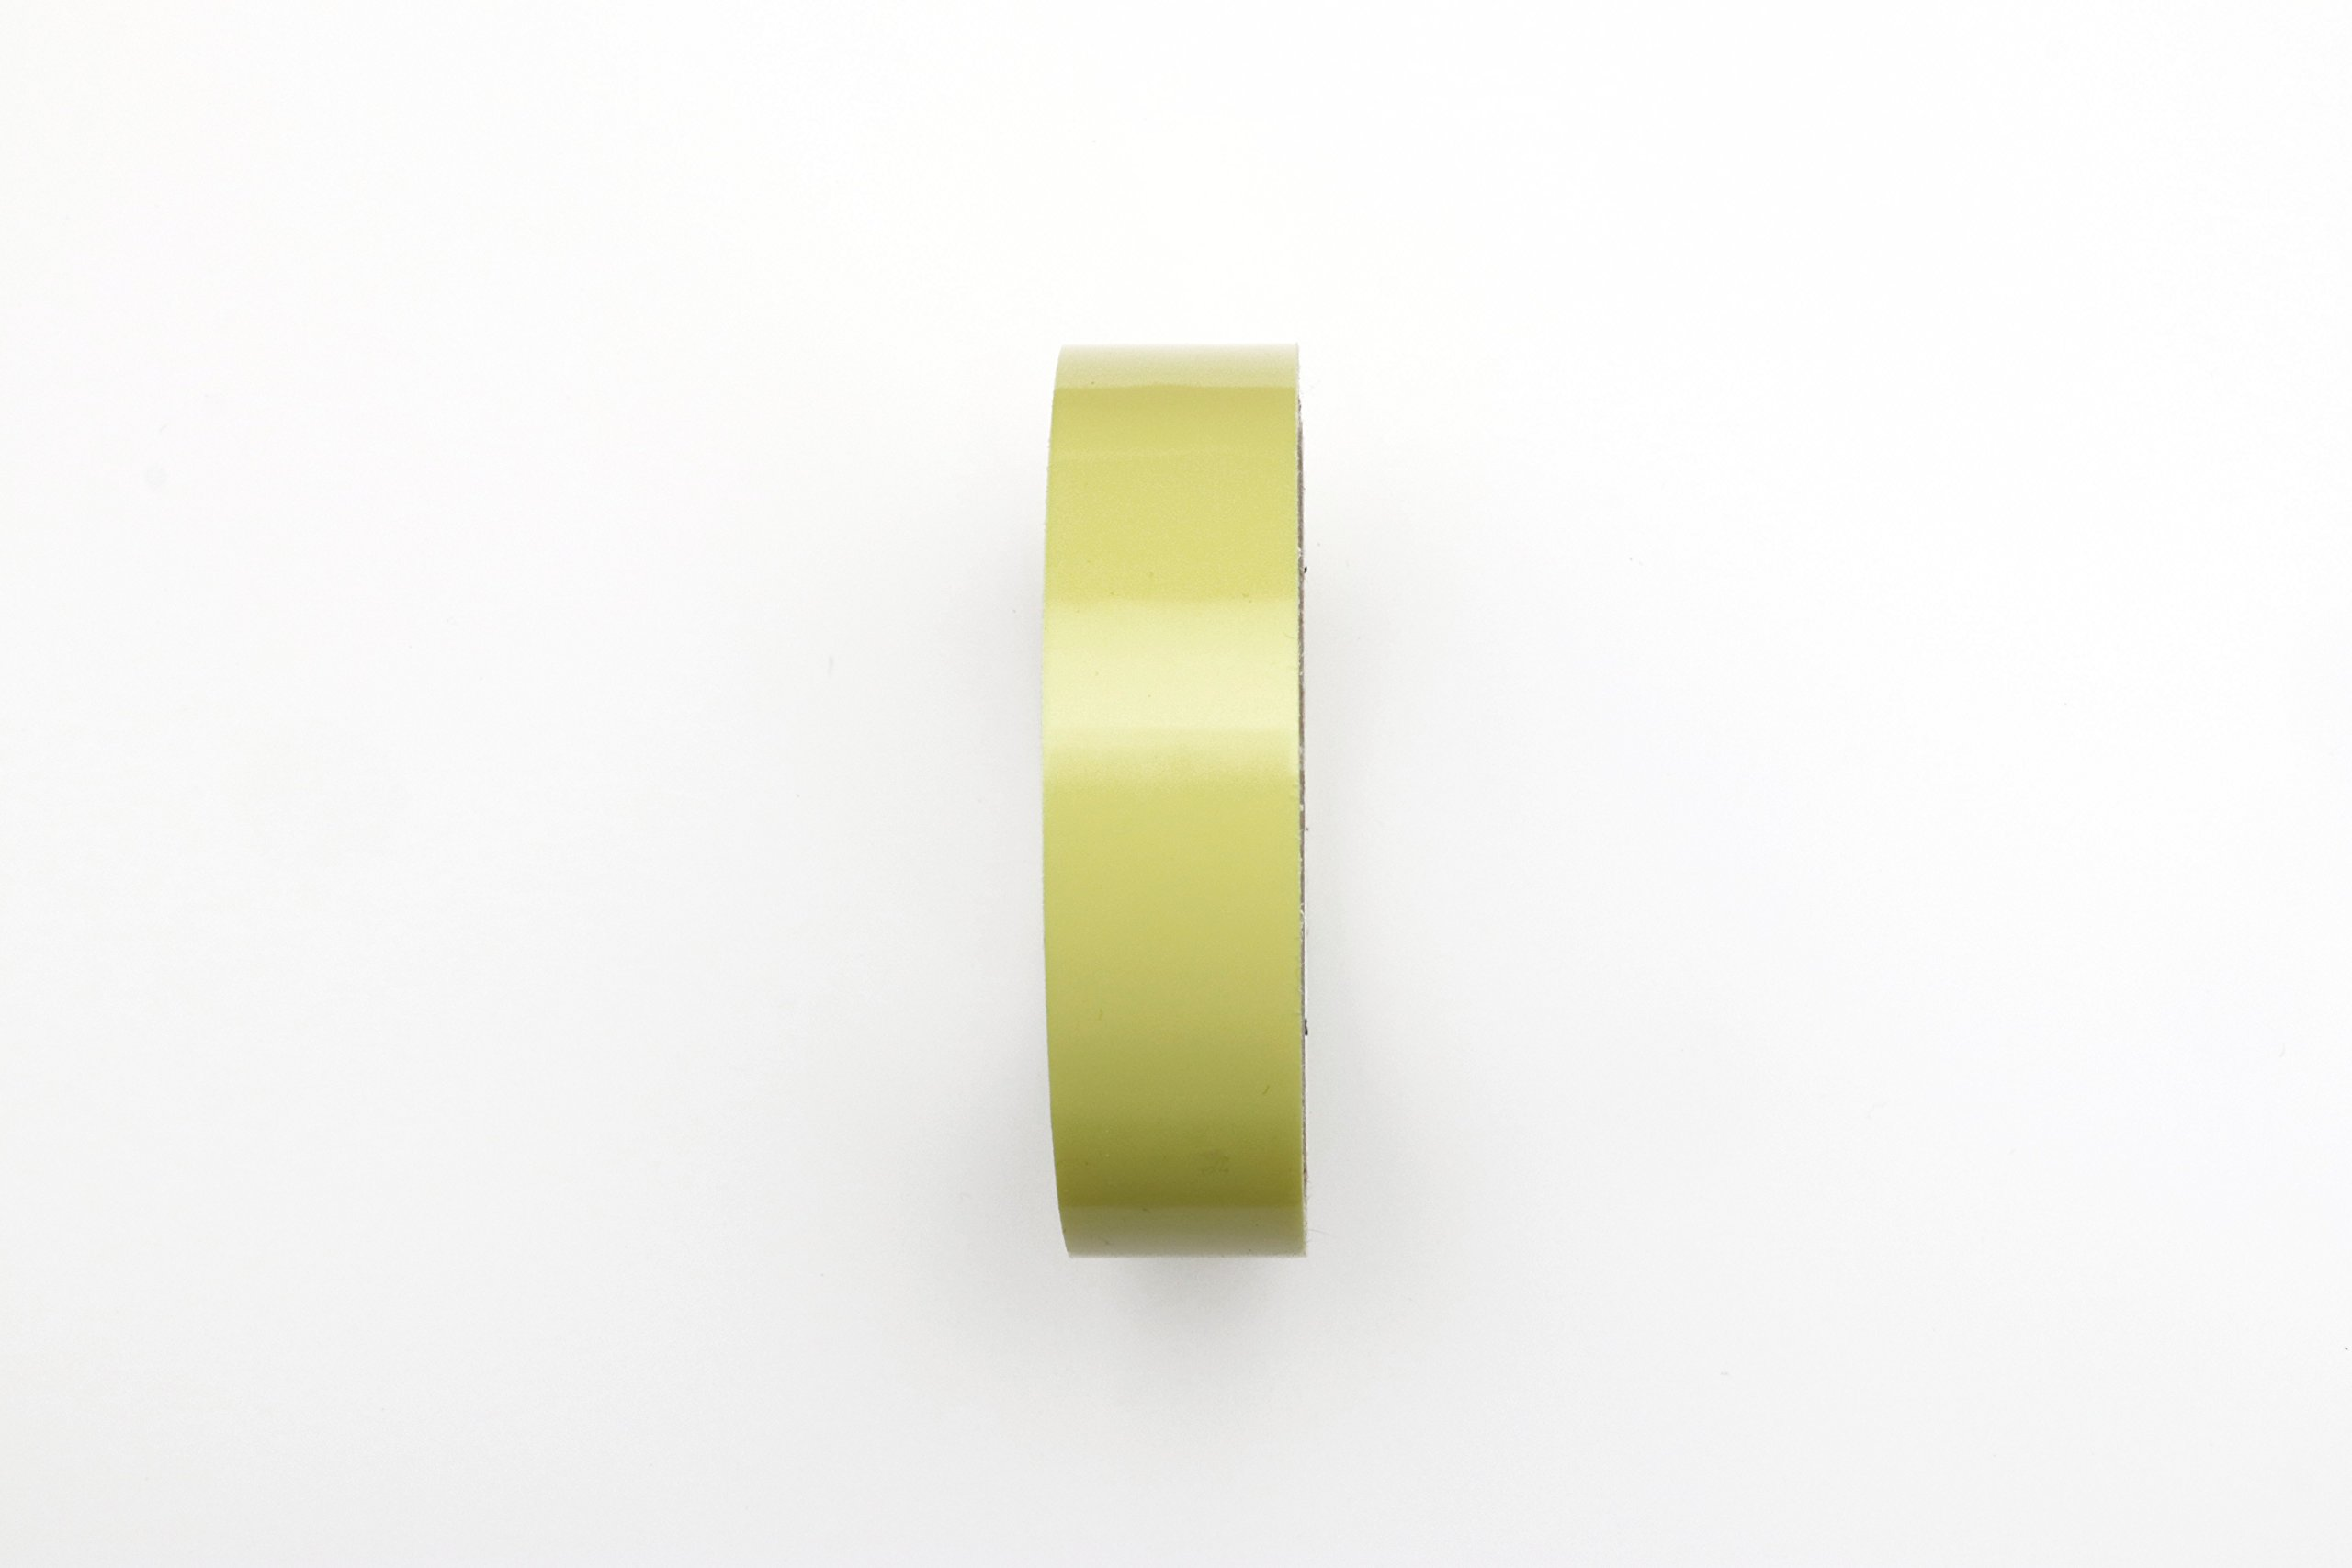 WTB TCS i23 28 mmx11 m Rim Tape Roll for 5 Wheels by WTB (Image #3)